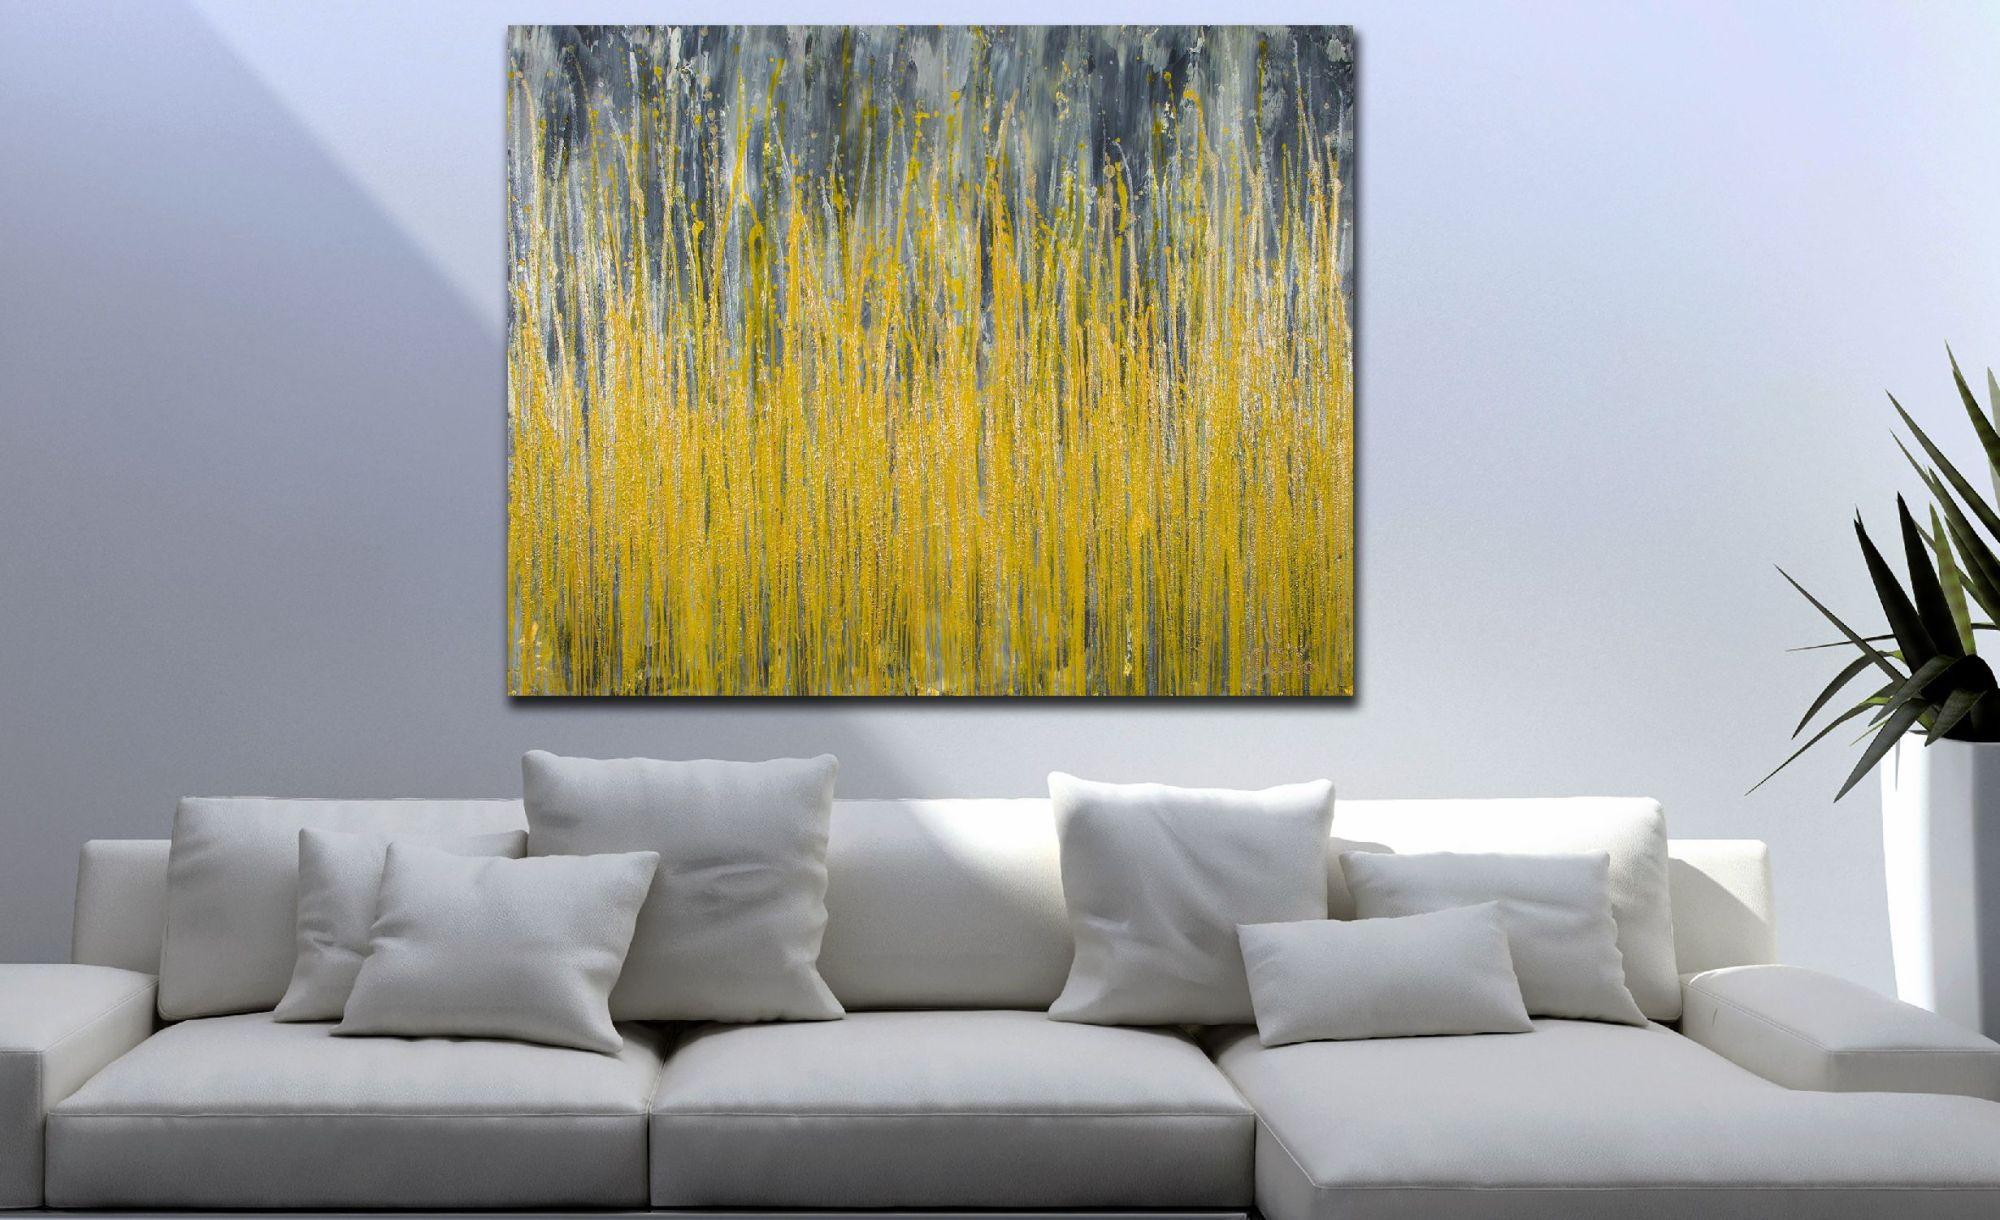 SOLD / Room View - Garden In Motion 4 (Autumn) (2020) by Nestor Toro